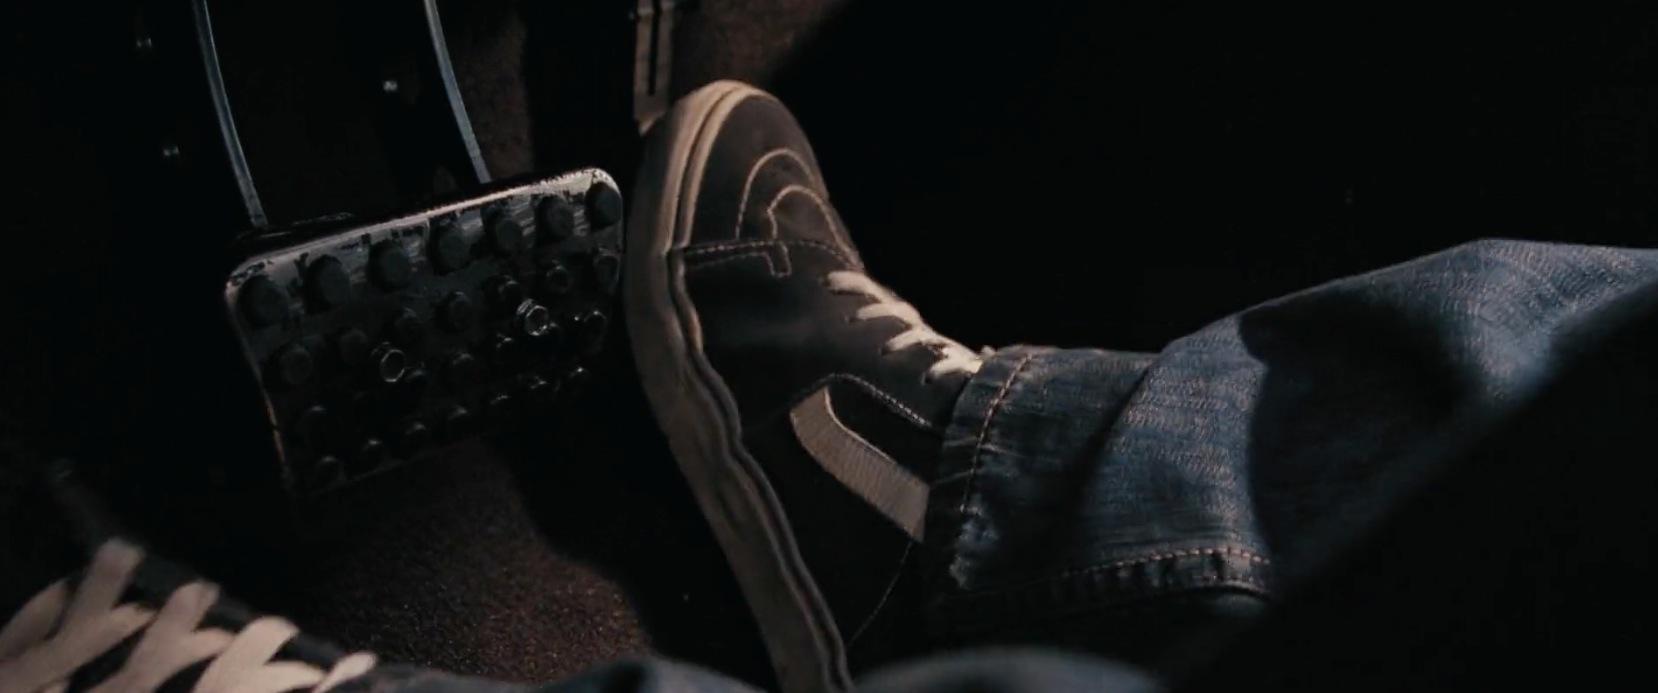 Paul Walker Shoes Price